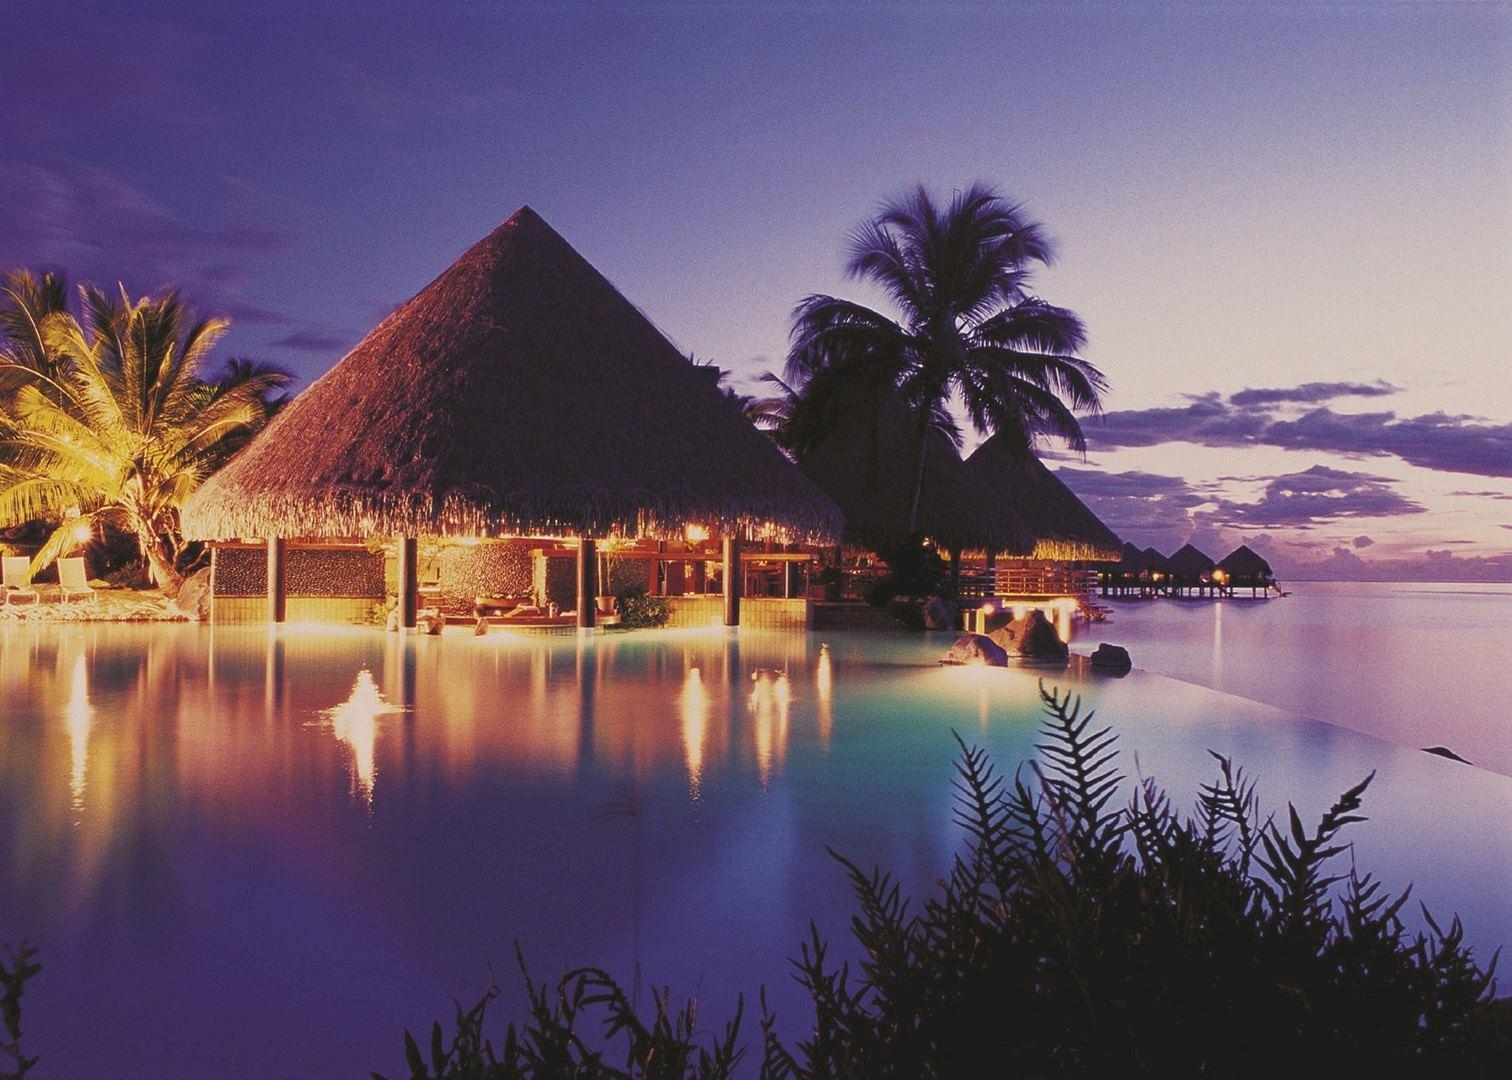 Manava Beach Resort And Spa And Tahiti Audley Travel